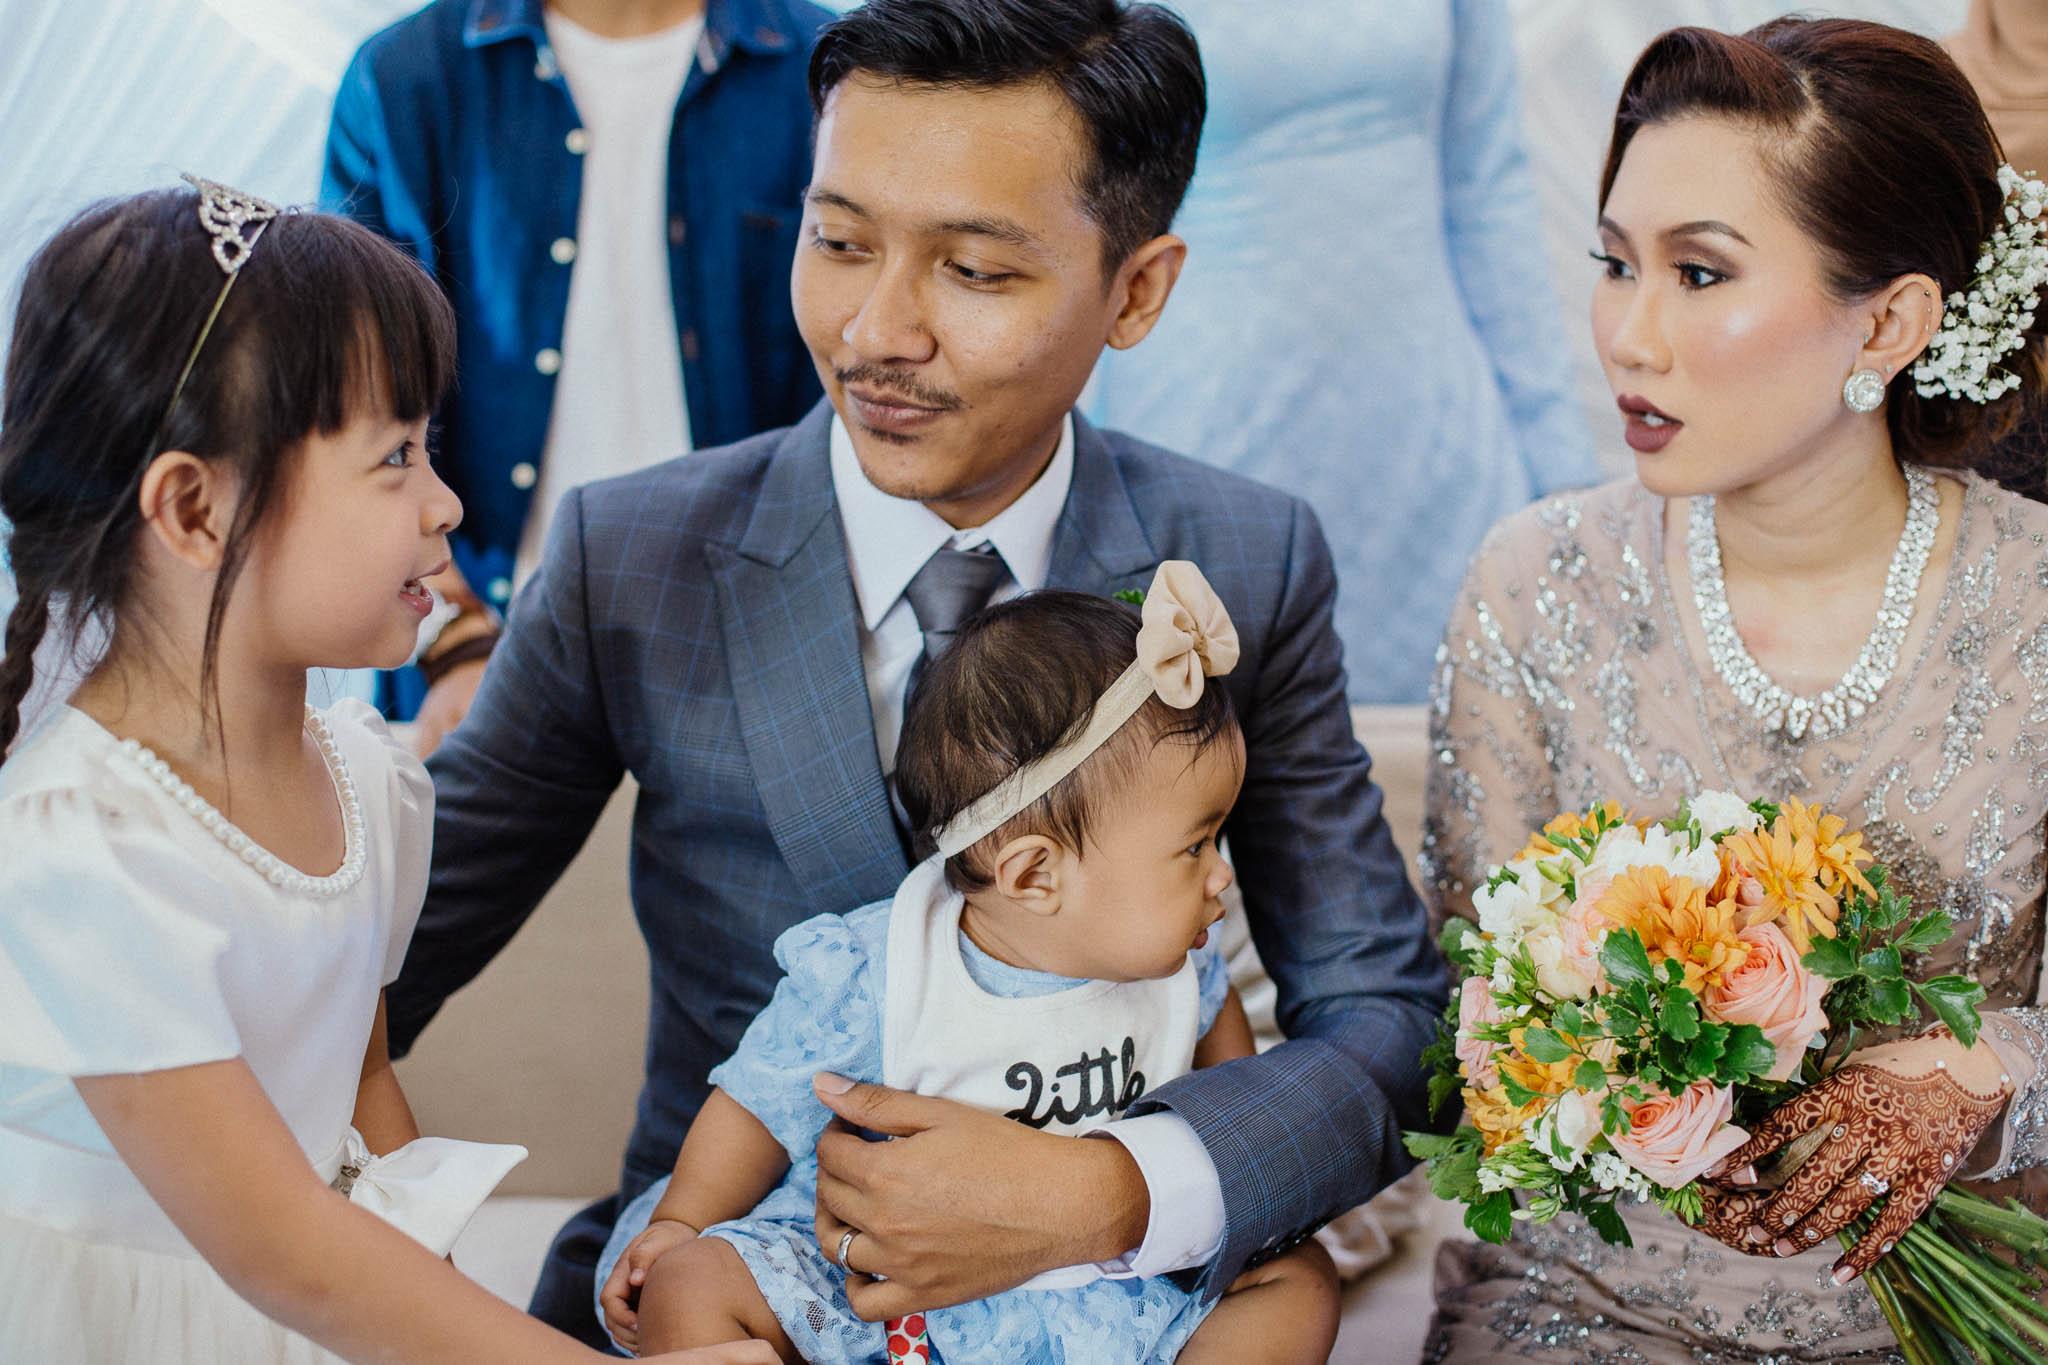 singapore-wedding-photographer-addafiq-nufail-060.jpg